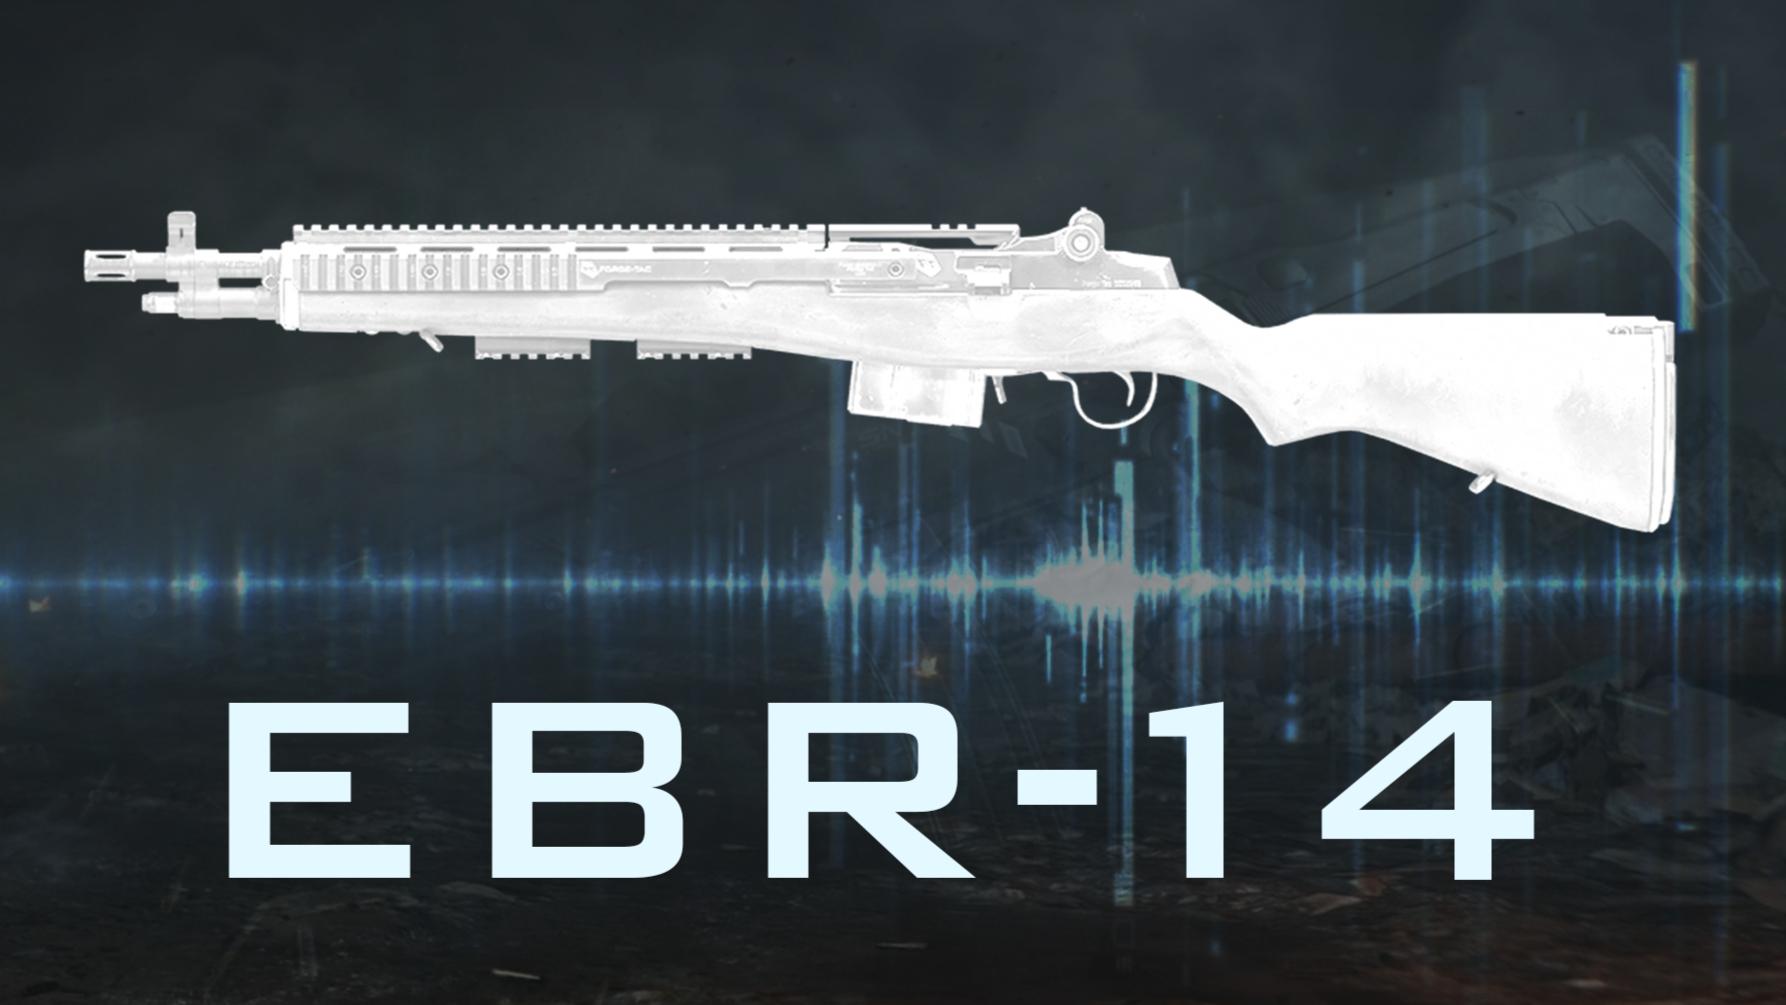 EBR-14 精确射手步枪『现代战争武器指南』VOL.10